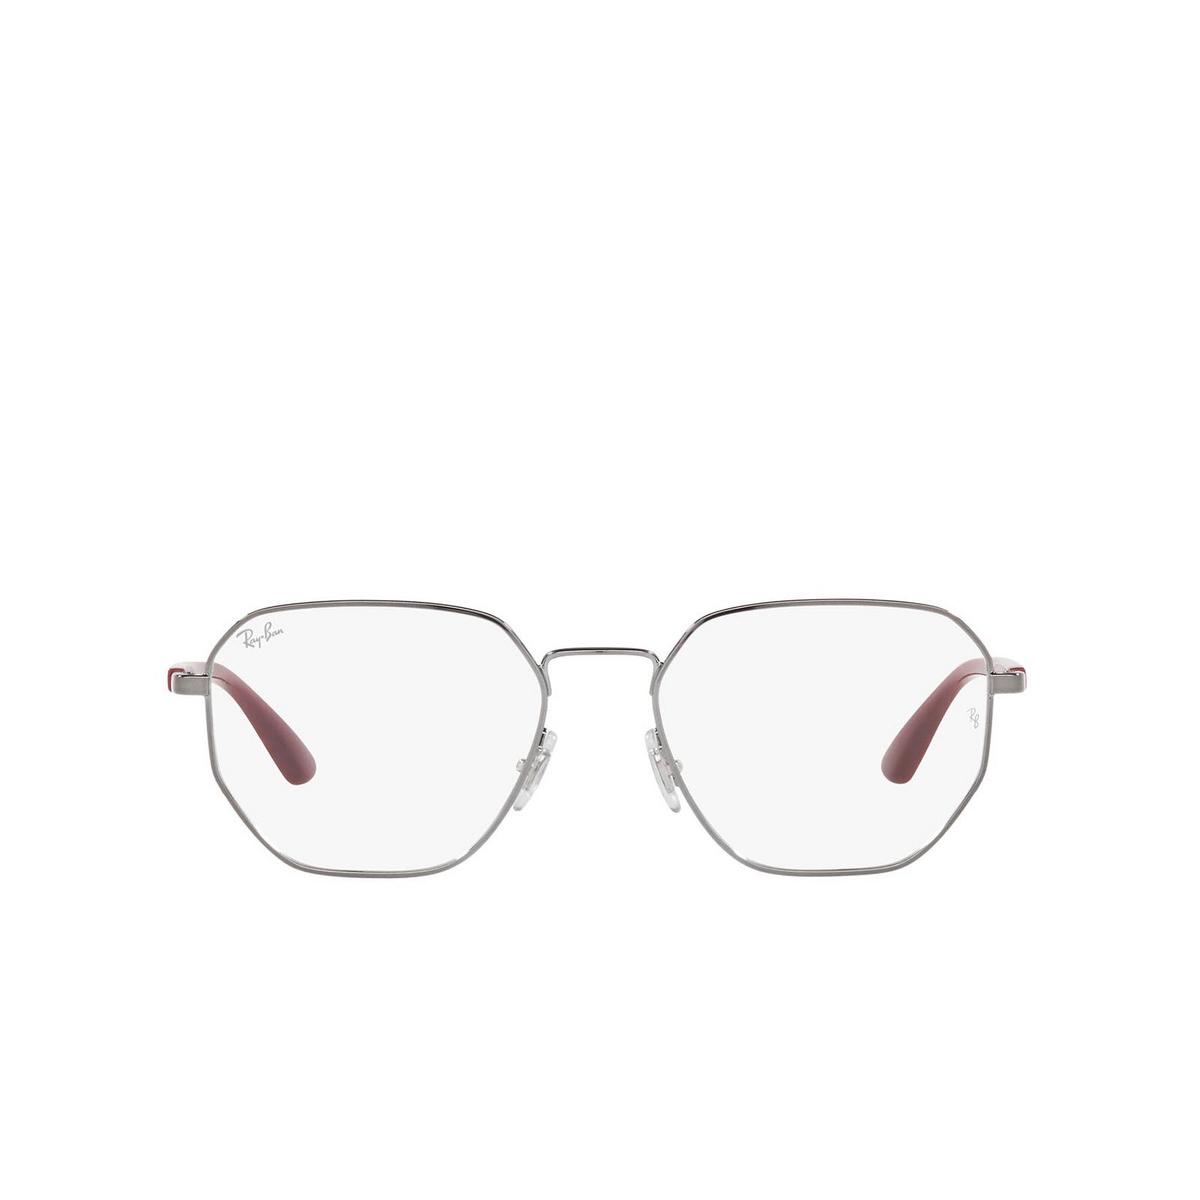 Ray-Ban® Irregular Eyeglasses: RX6471 color Gunmetal 2502.